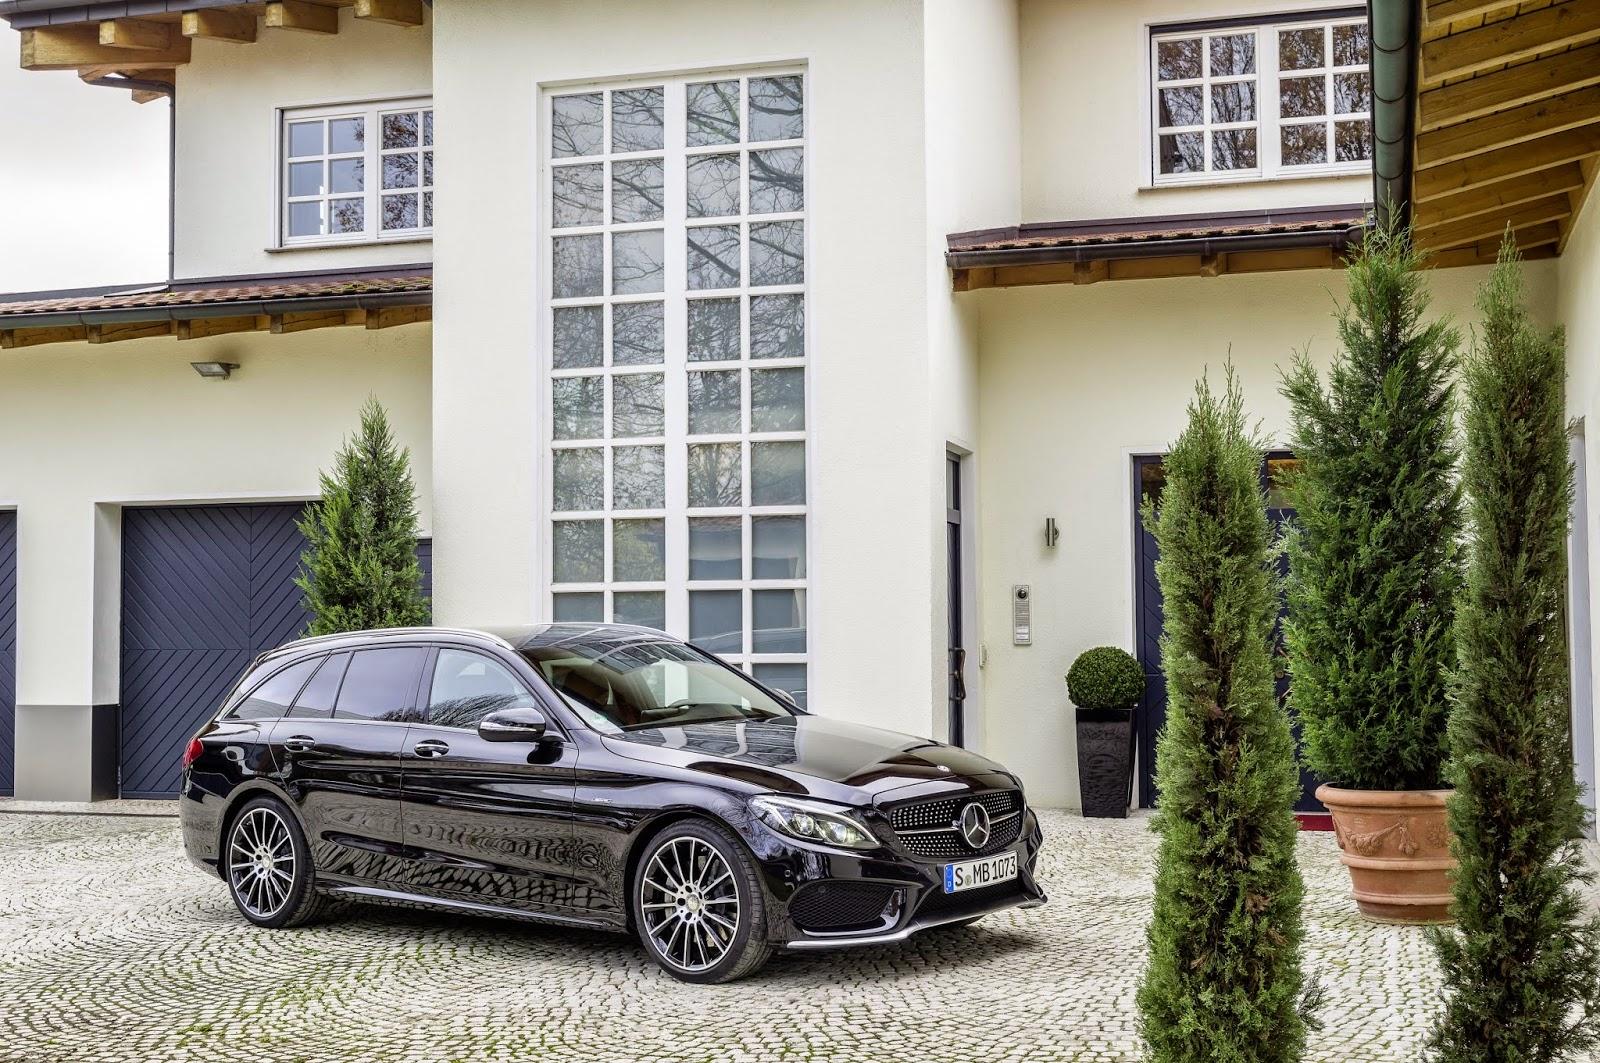 Mercedes Benz C450 AMG stationary